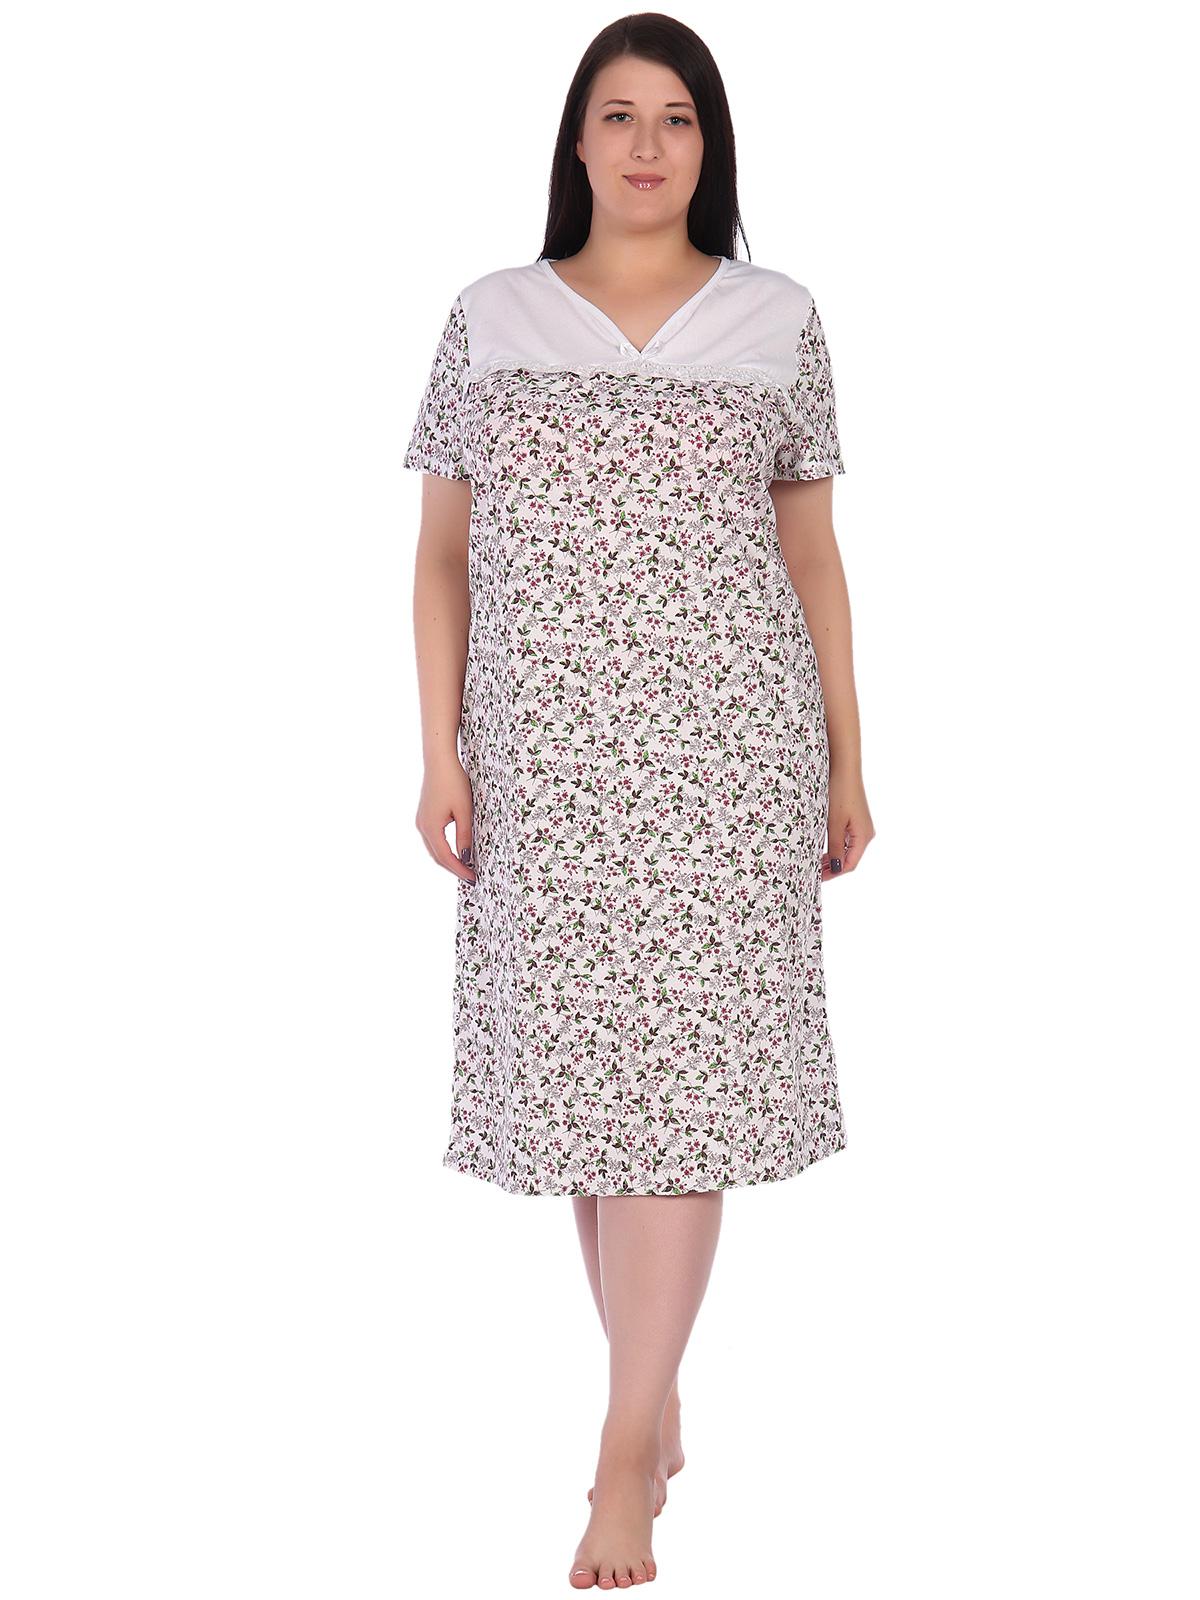 Жен. сорочка арт. 16-0639 Белый р. 60 НСД Трикотаж